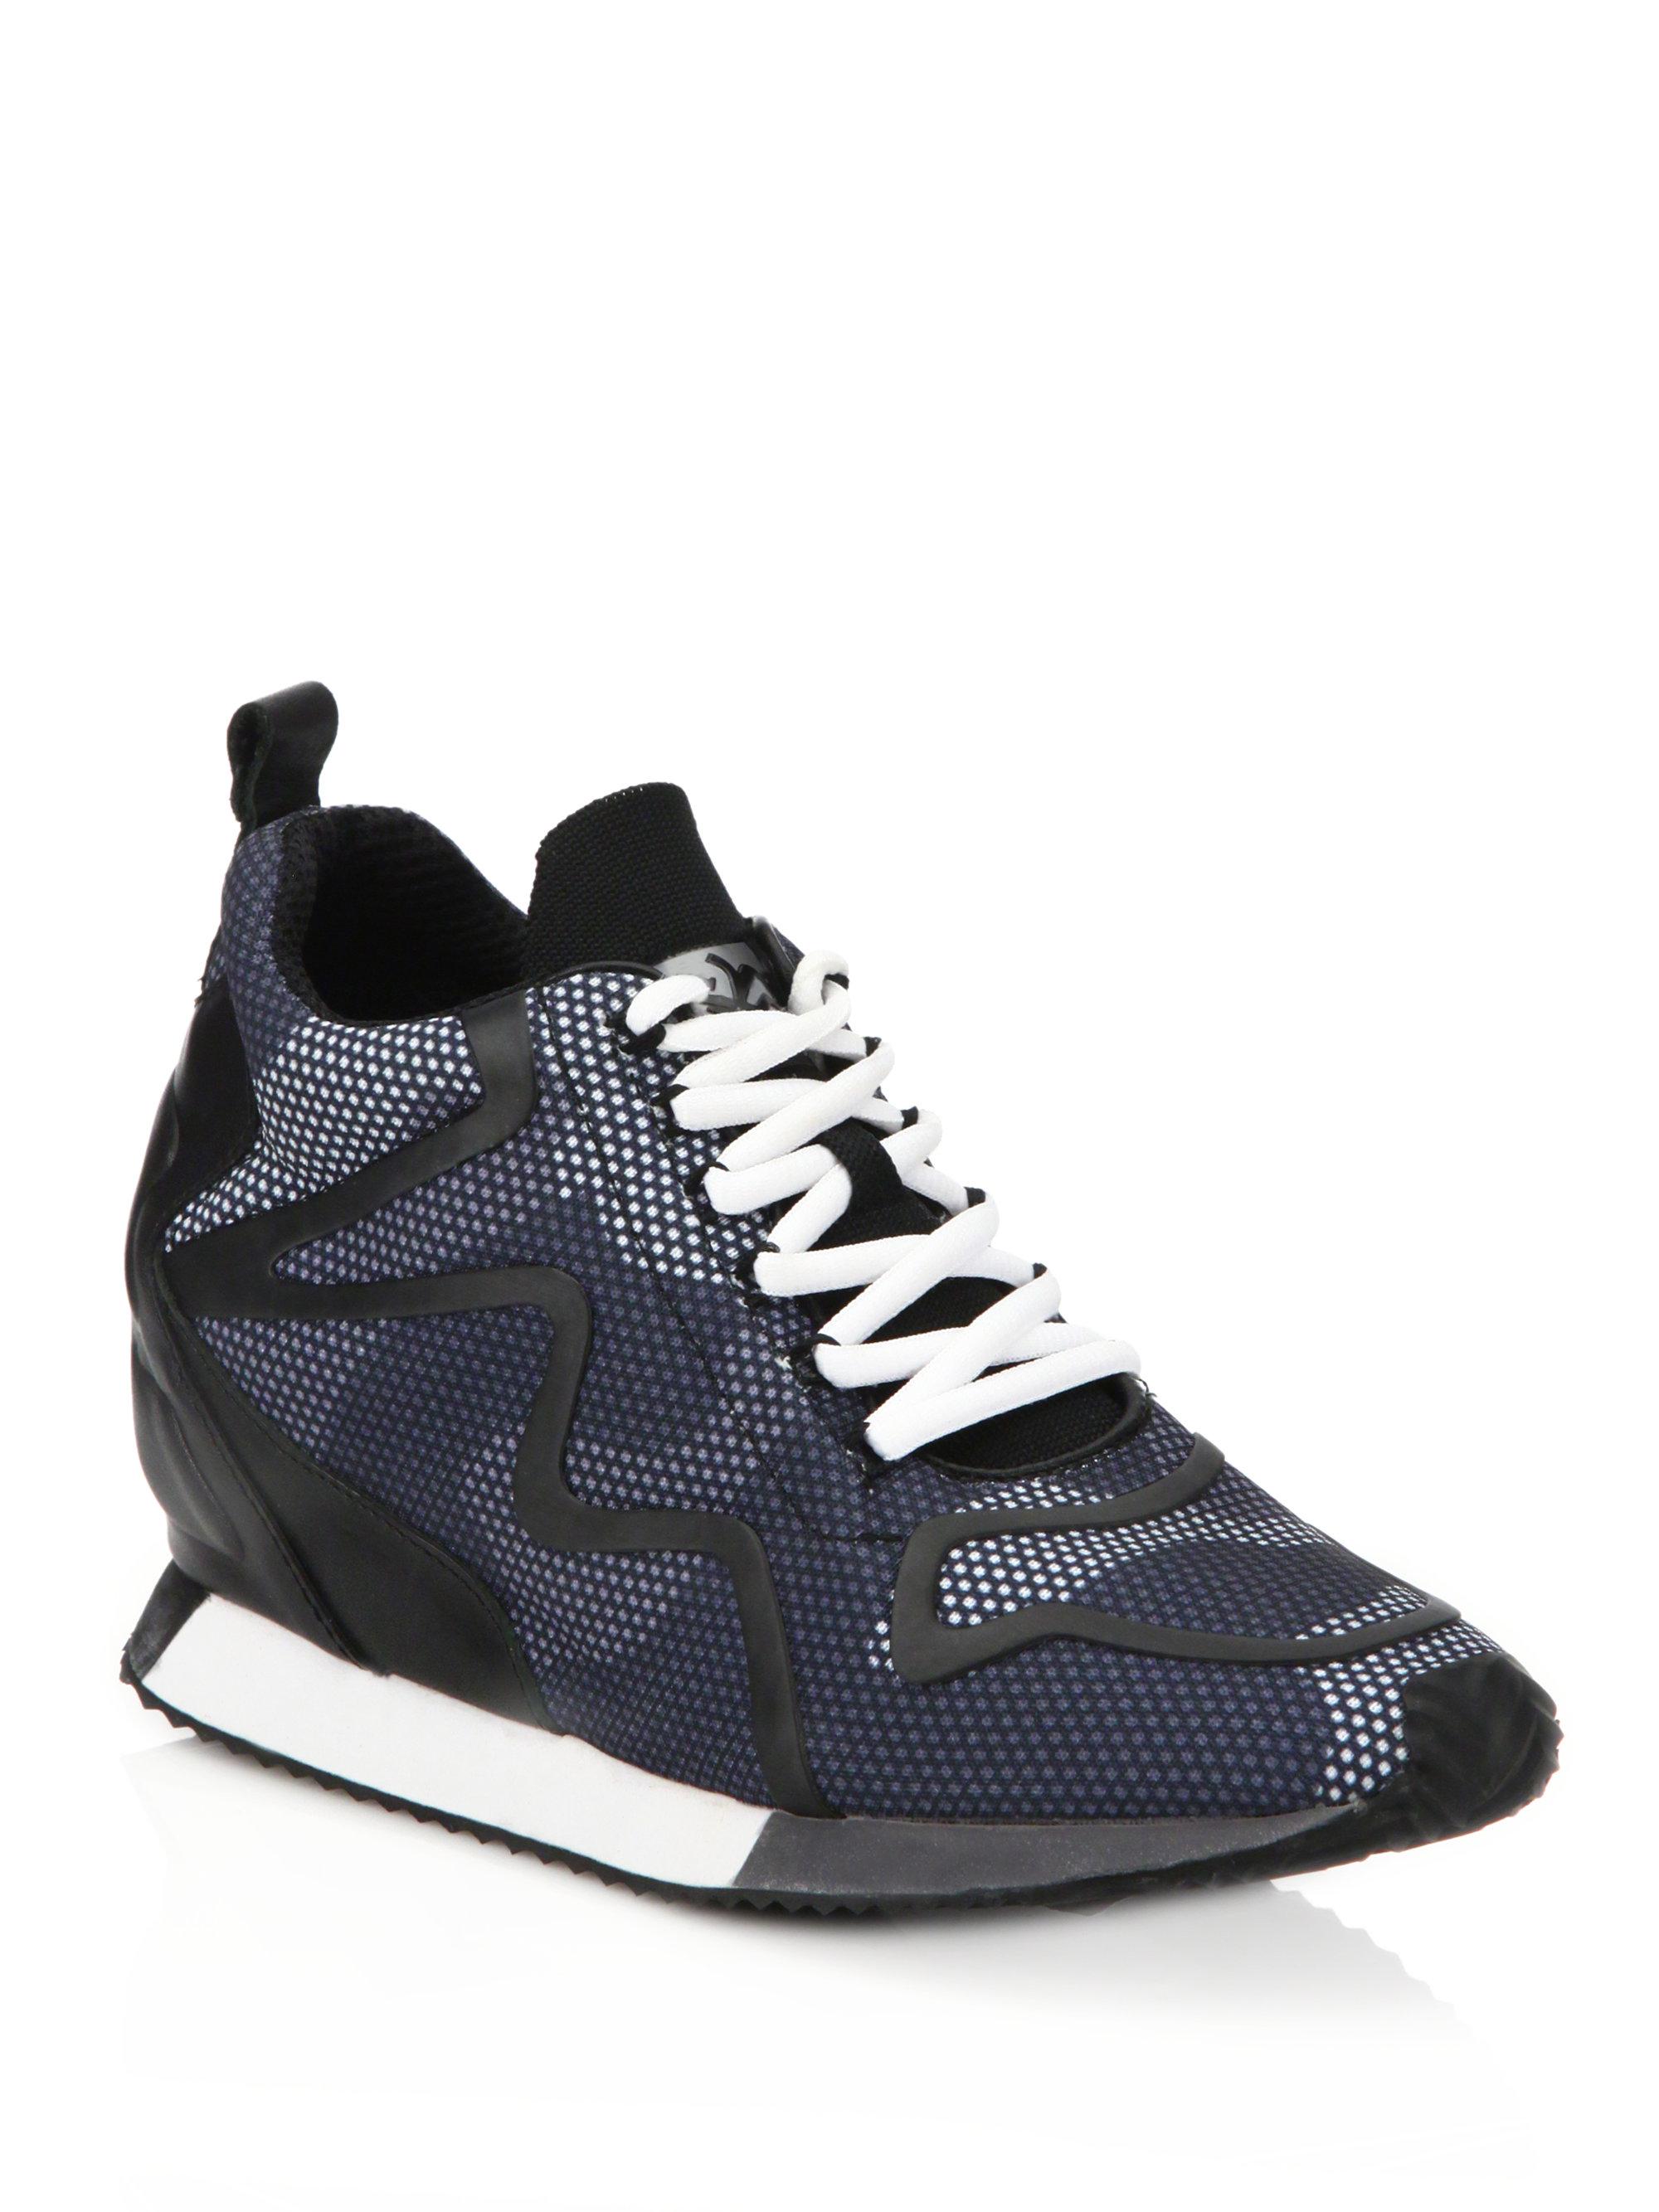 Ash Domino Leather Trim Printed Wedge Sneakers In Black Lyst